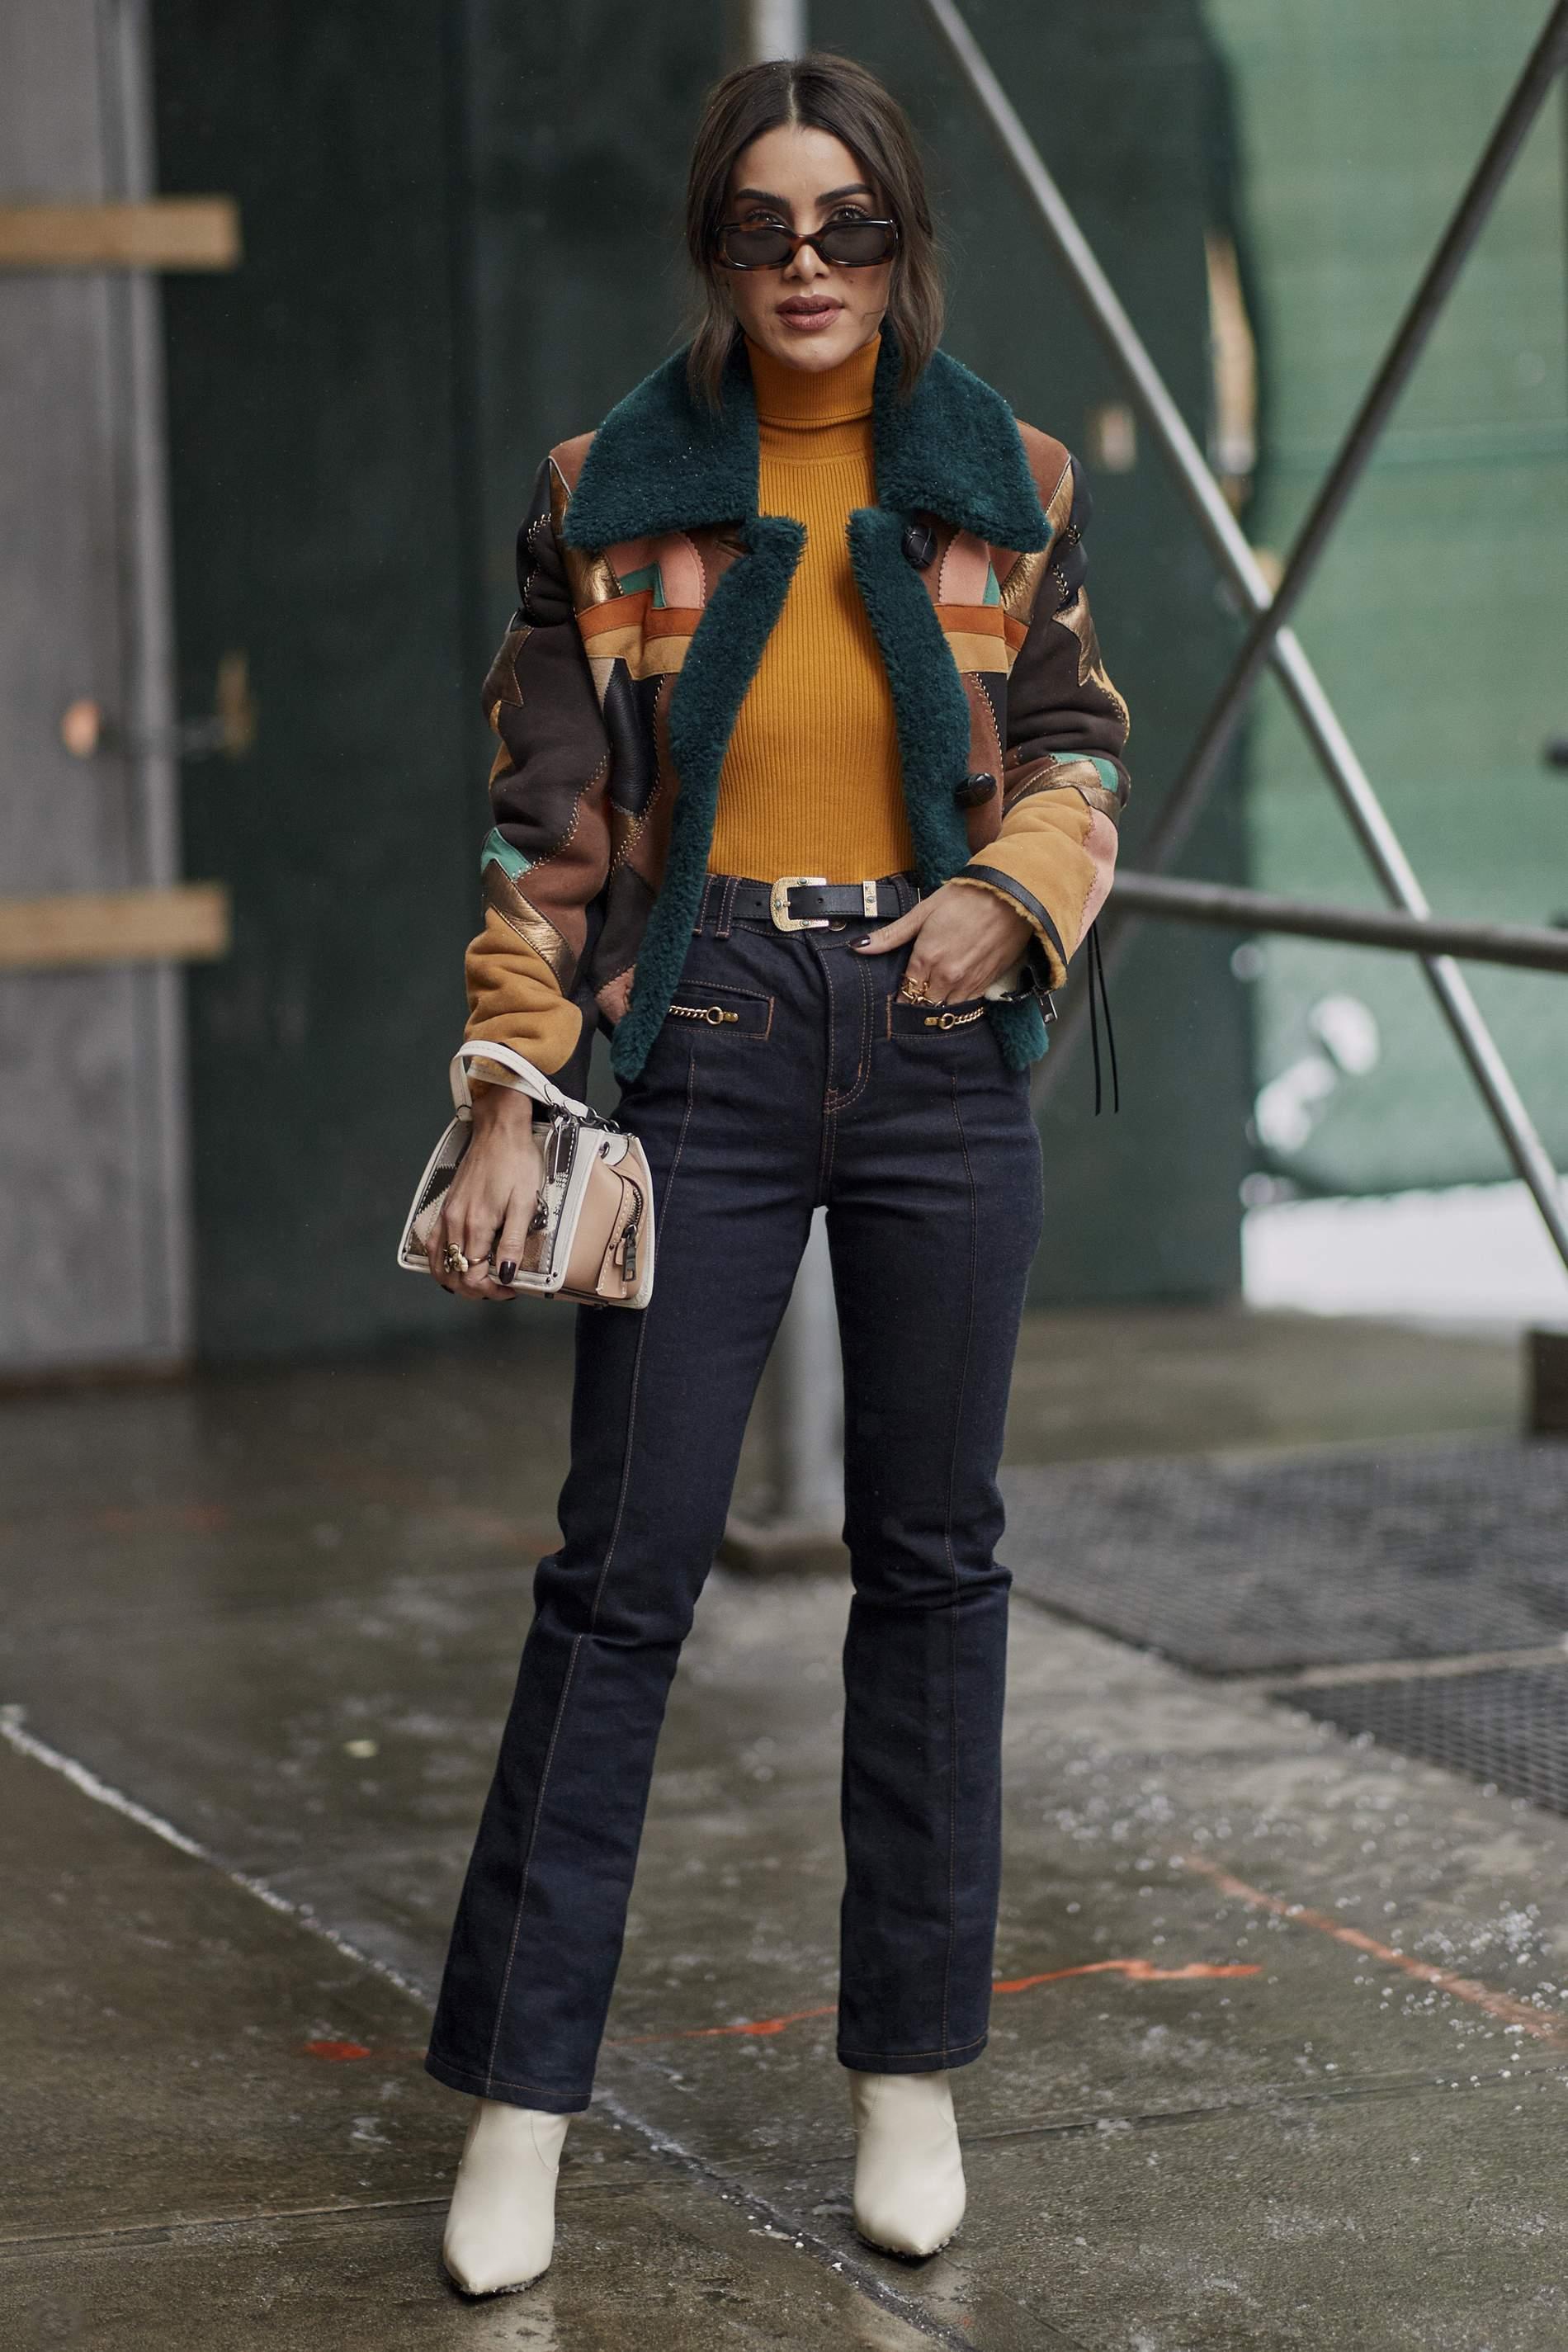 2ad44bc63807 Best Dressed: New York Fashion Week FW19 Street Style | PORTER